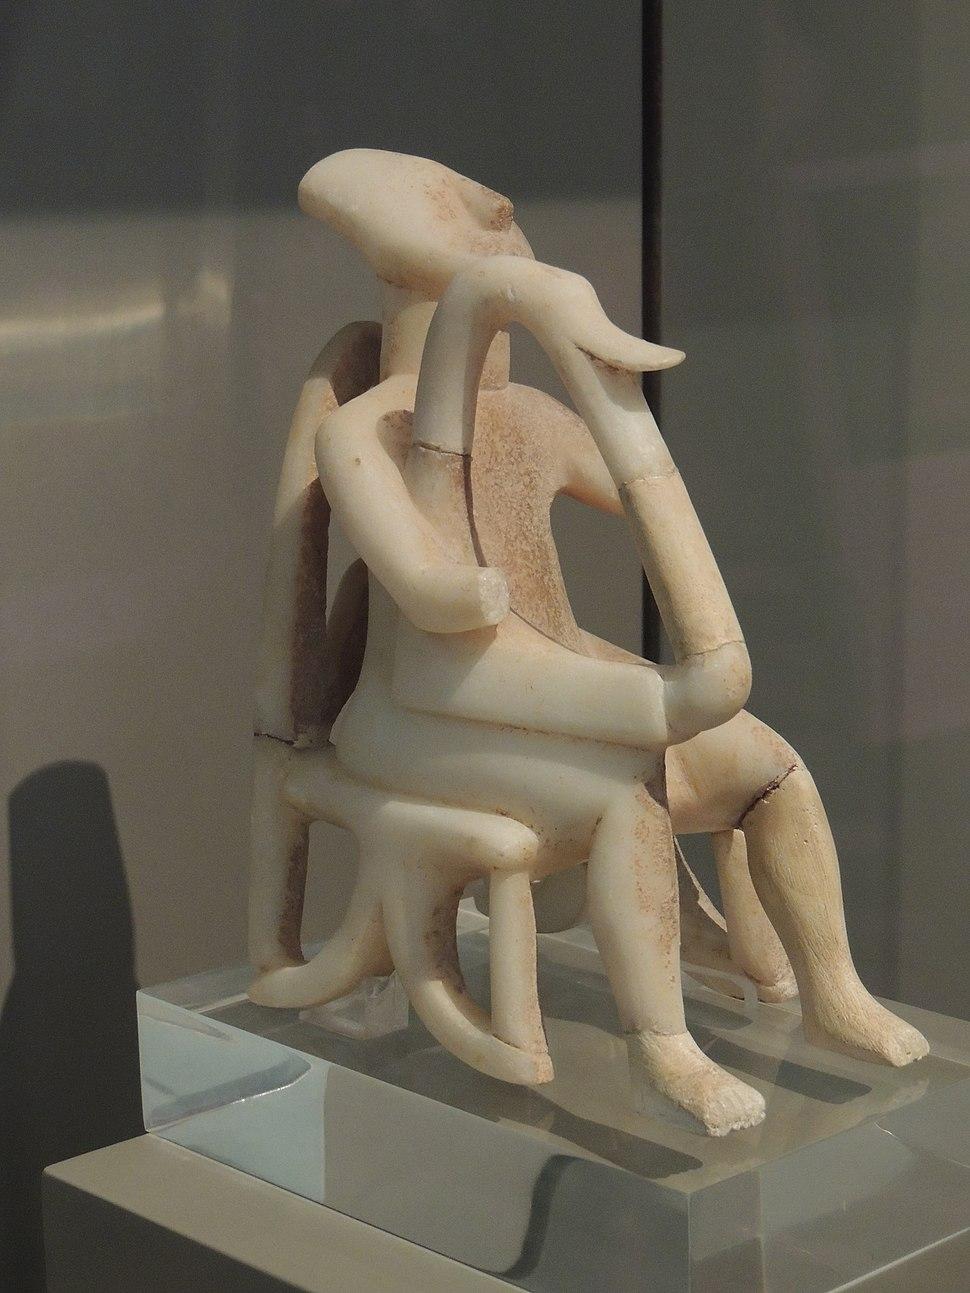 Harp player, Cycladic civilization - Greece